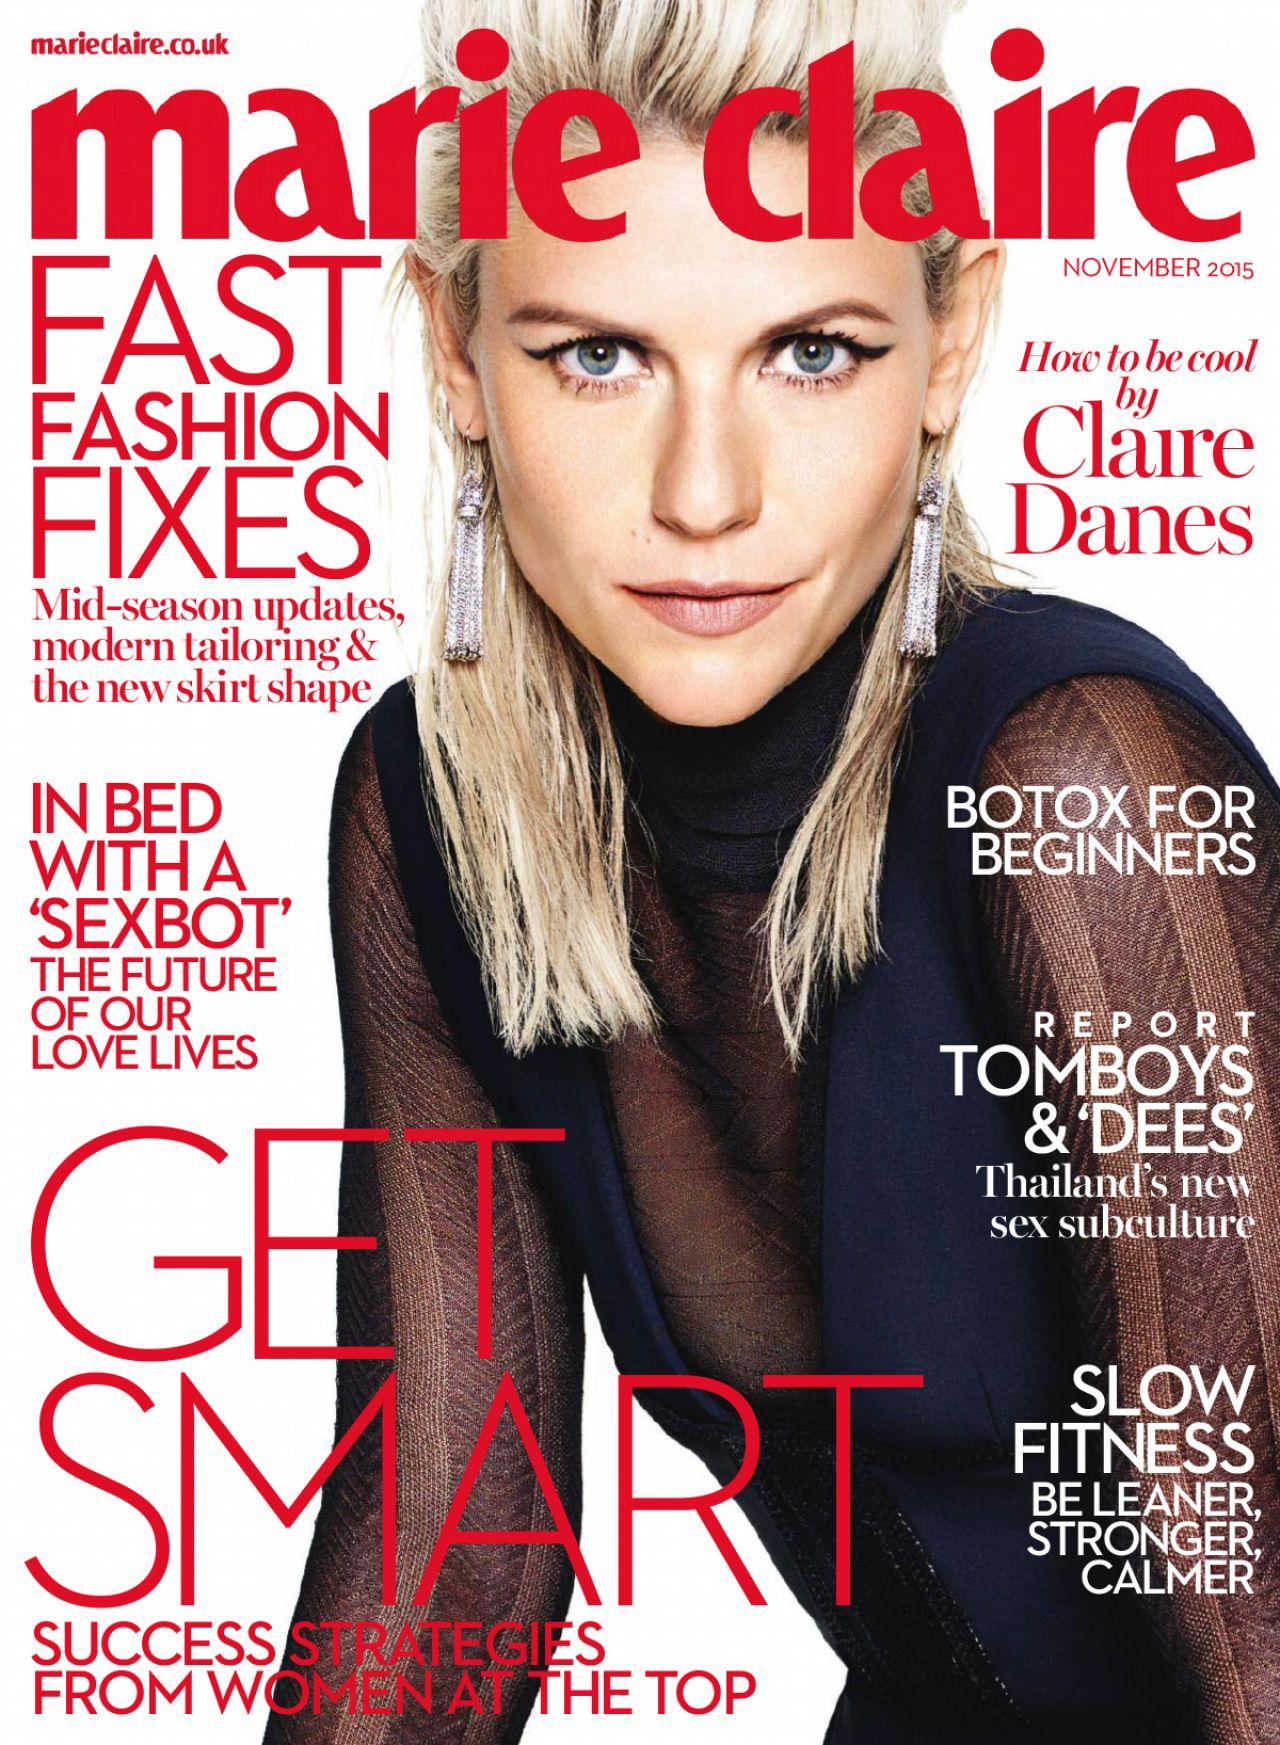 Marie Claire Magazine UK November 2015 Issue